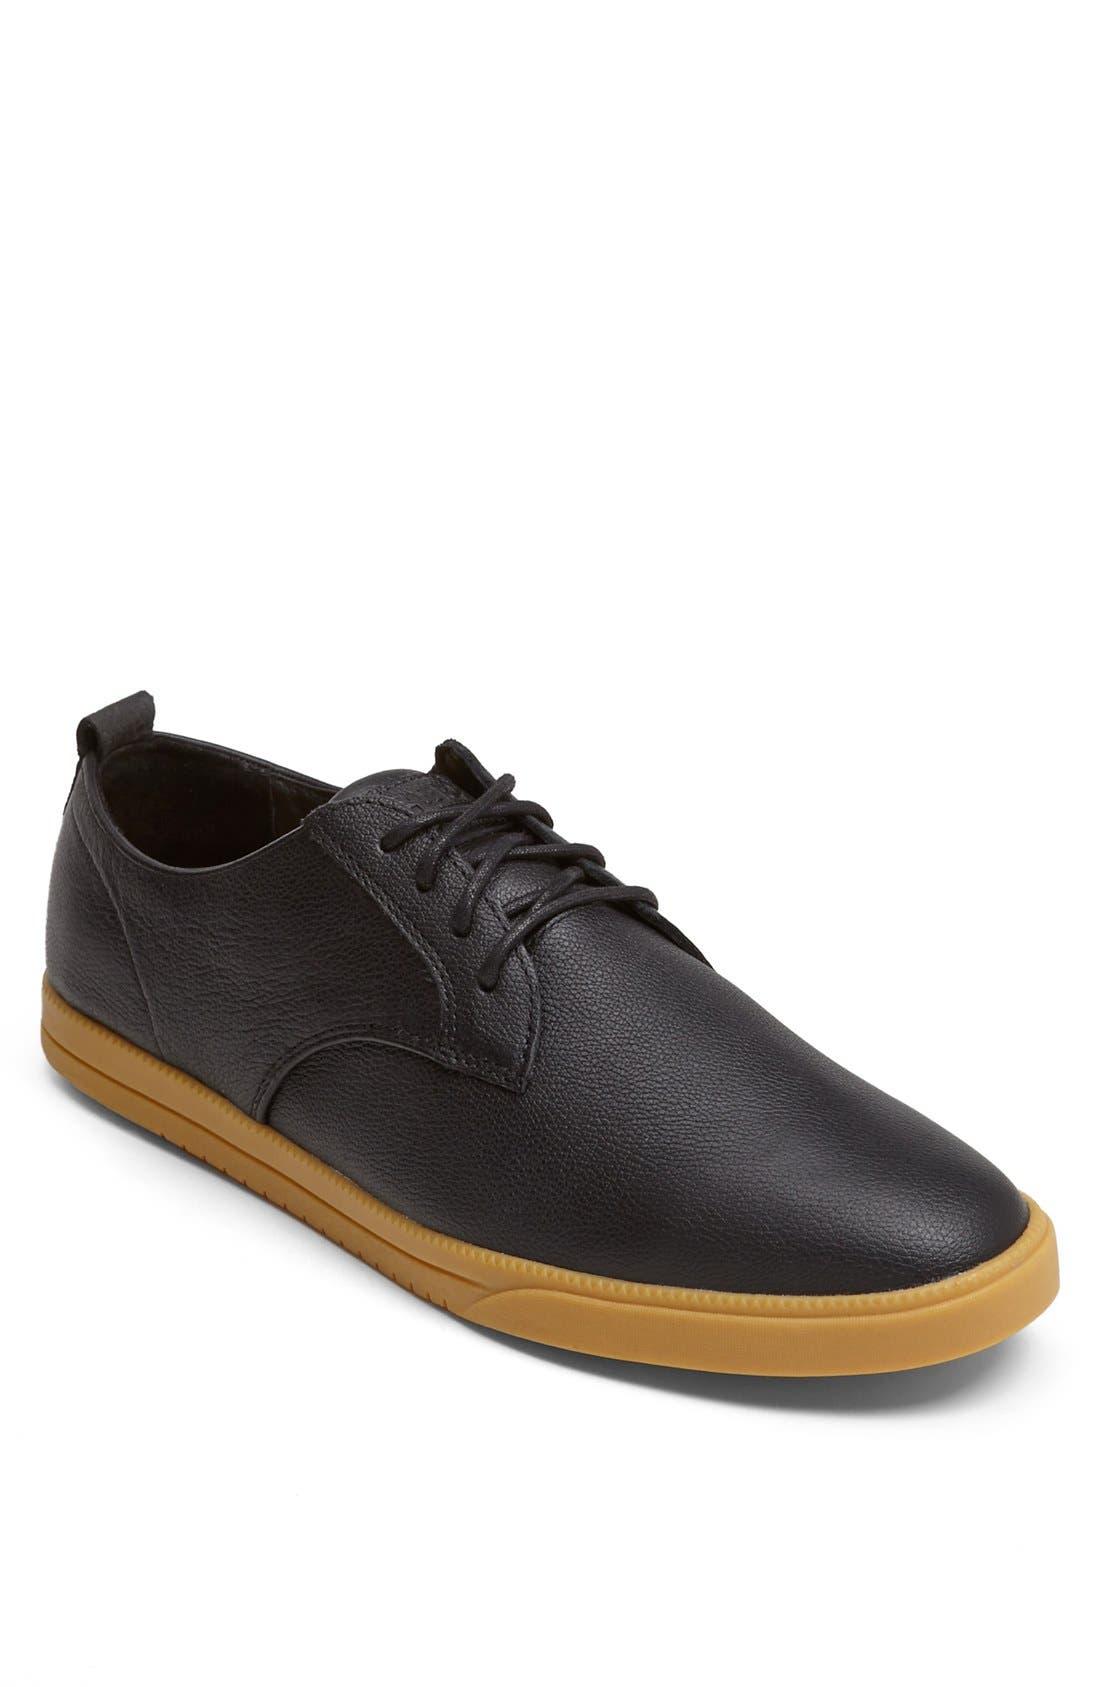 CLAE 'Ellington' Sneaker, Main, color, 001